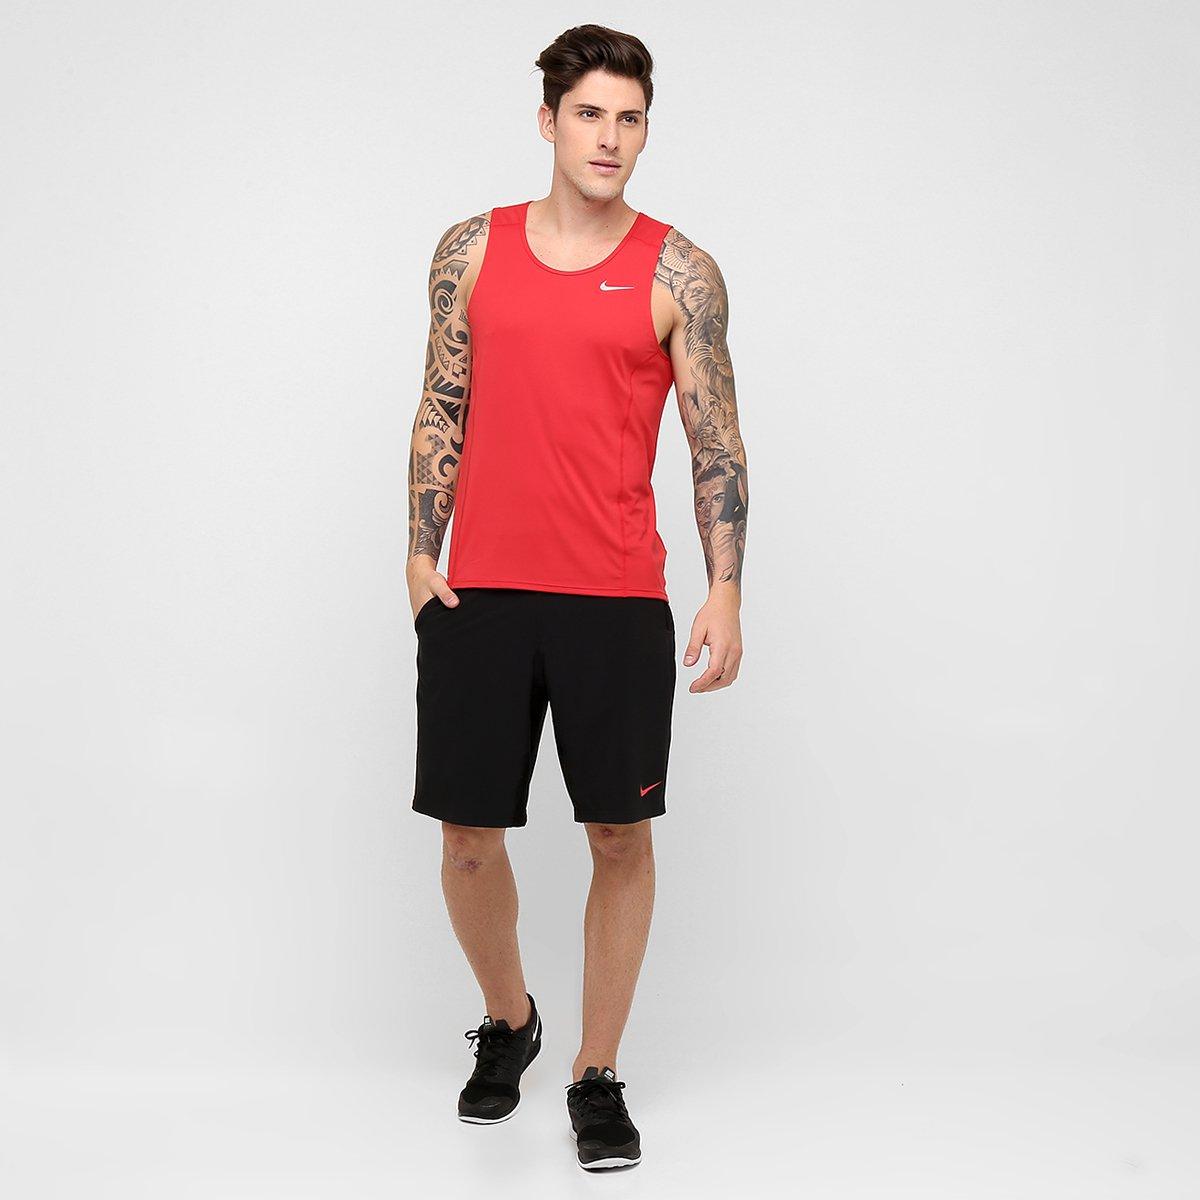 c48f4f0c5e Regata Nike Dri-Fit Miler Singlet Masculina - Compre Agora